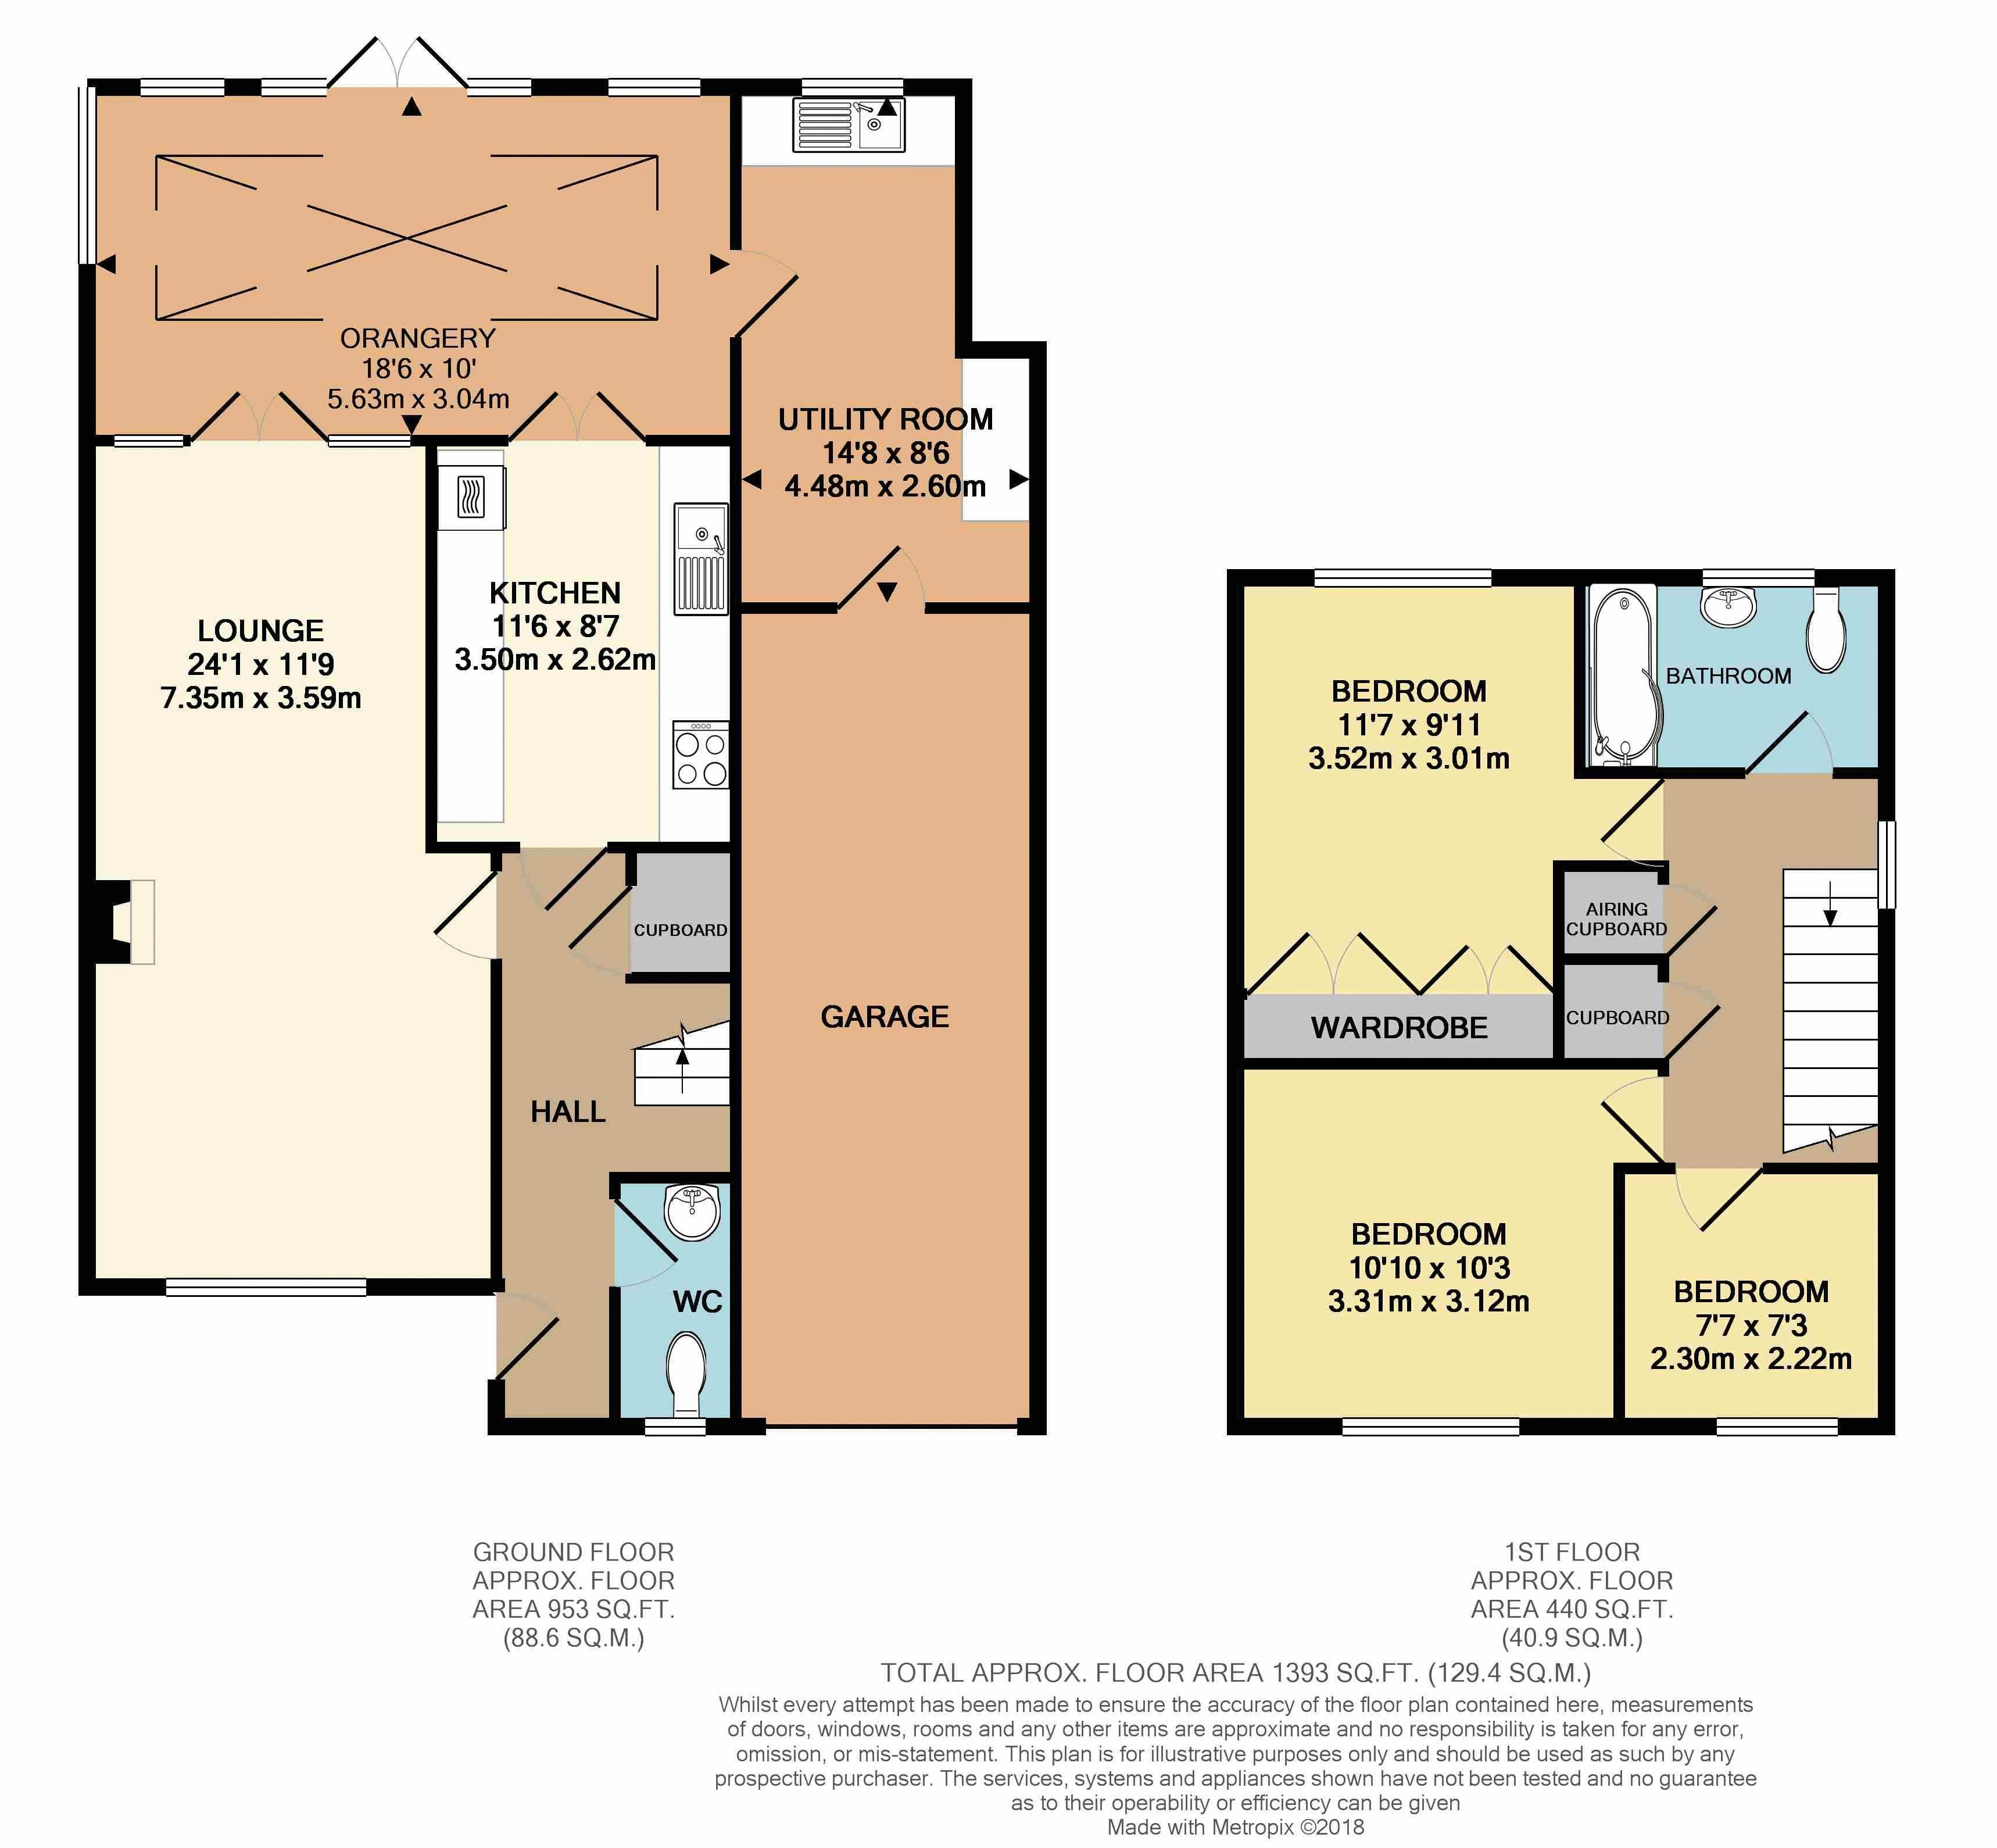 Turnfurlong Lane, Aylesbury HP21, 3 Bedroom Detached House